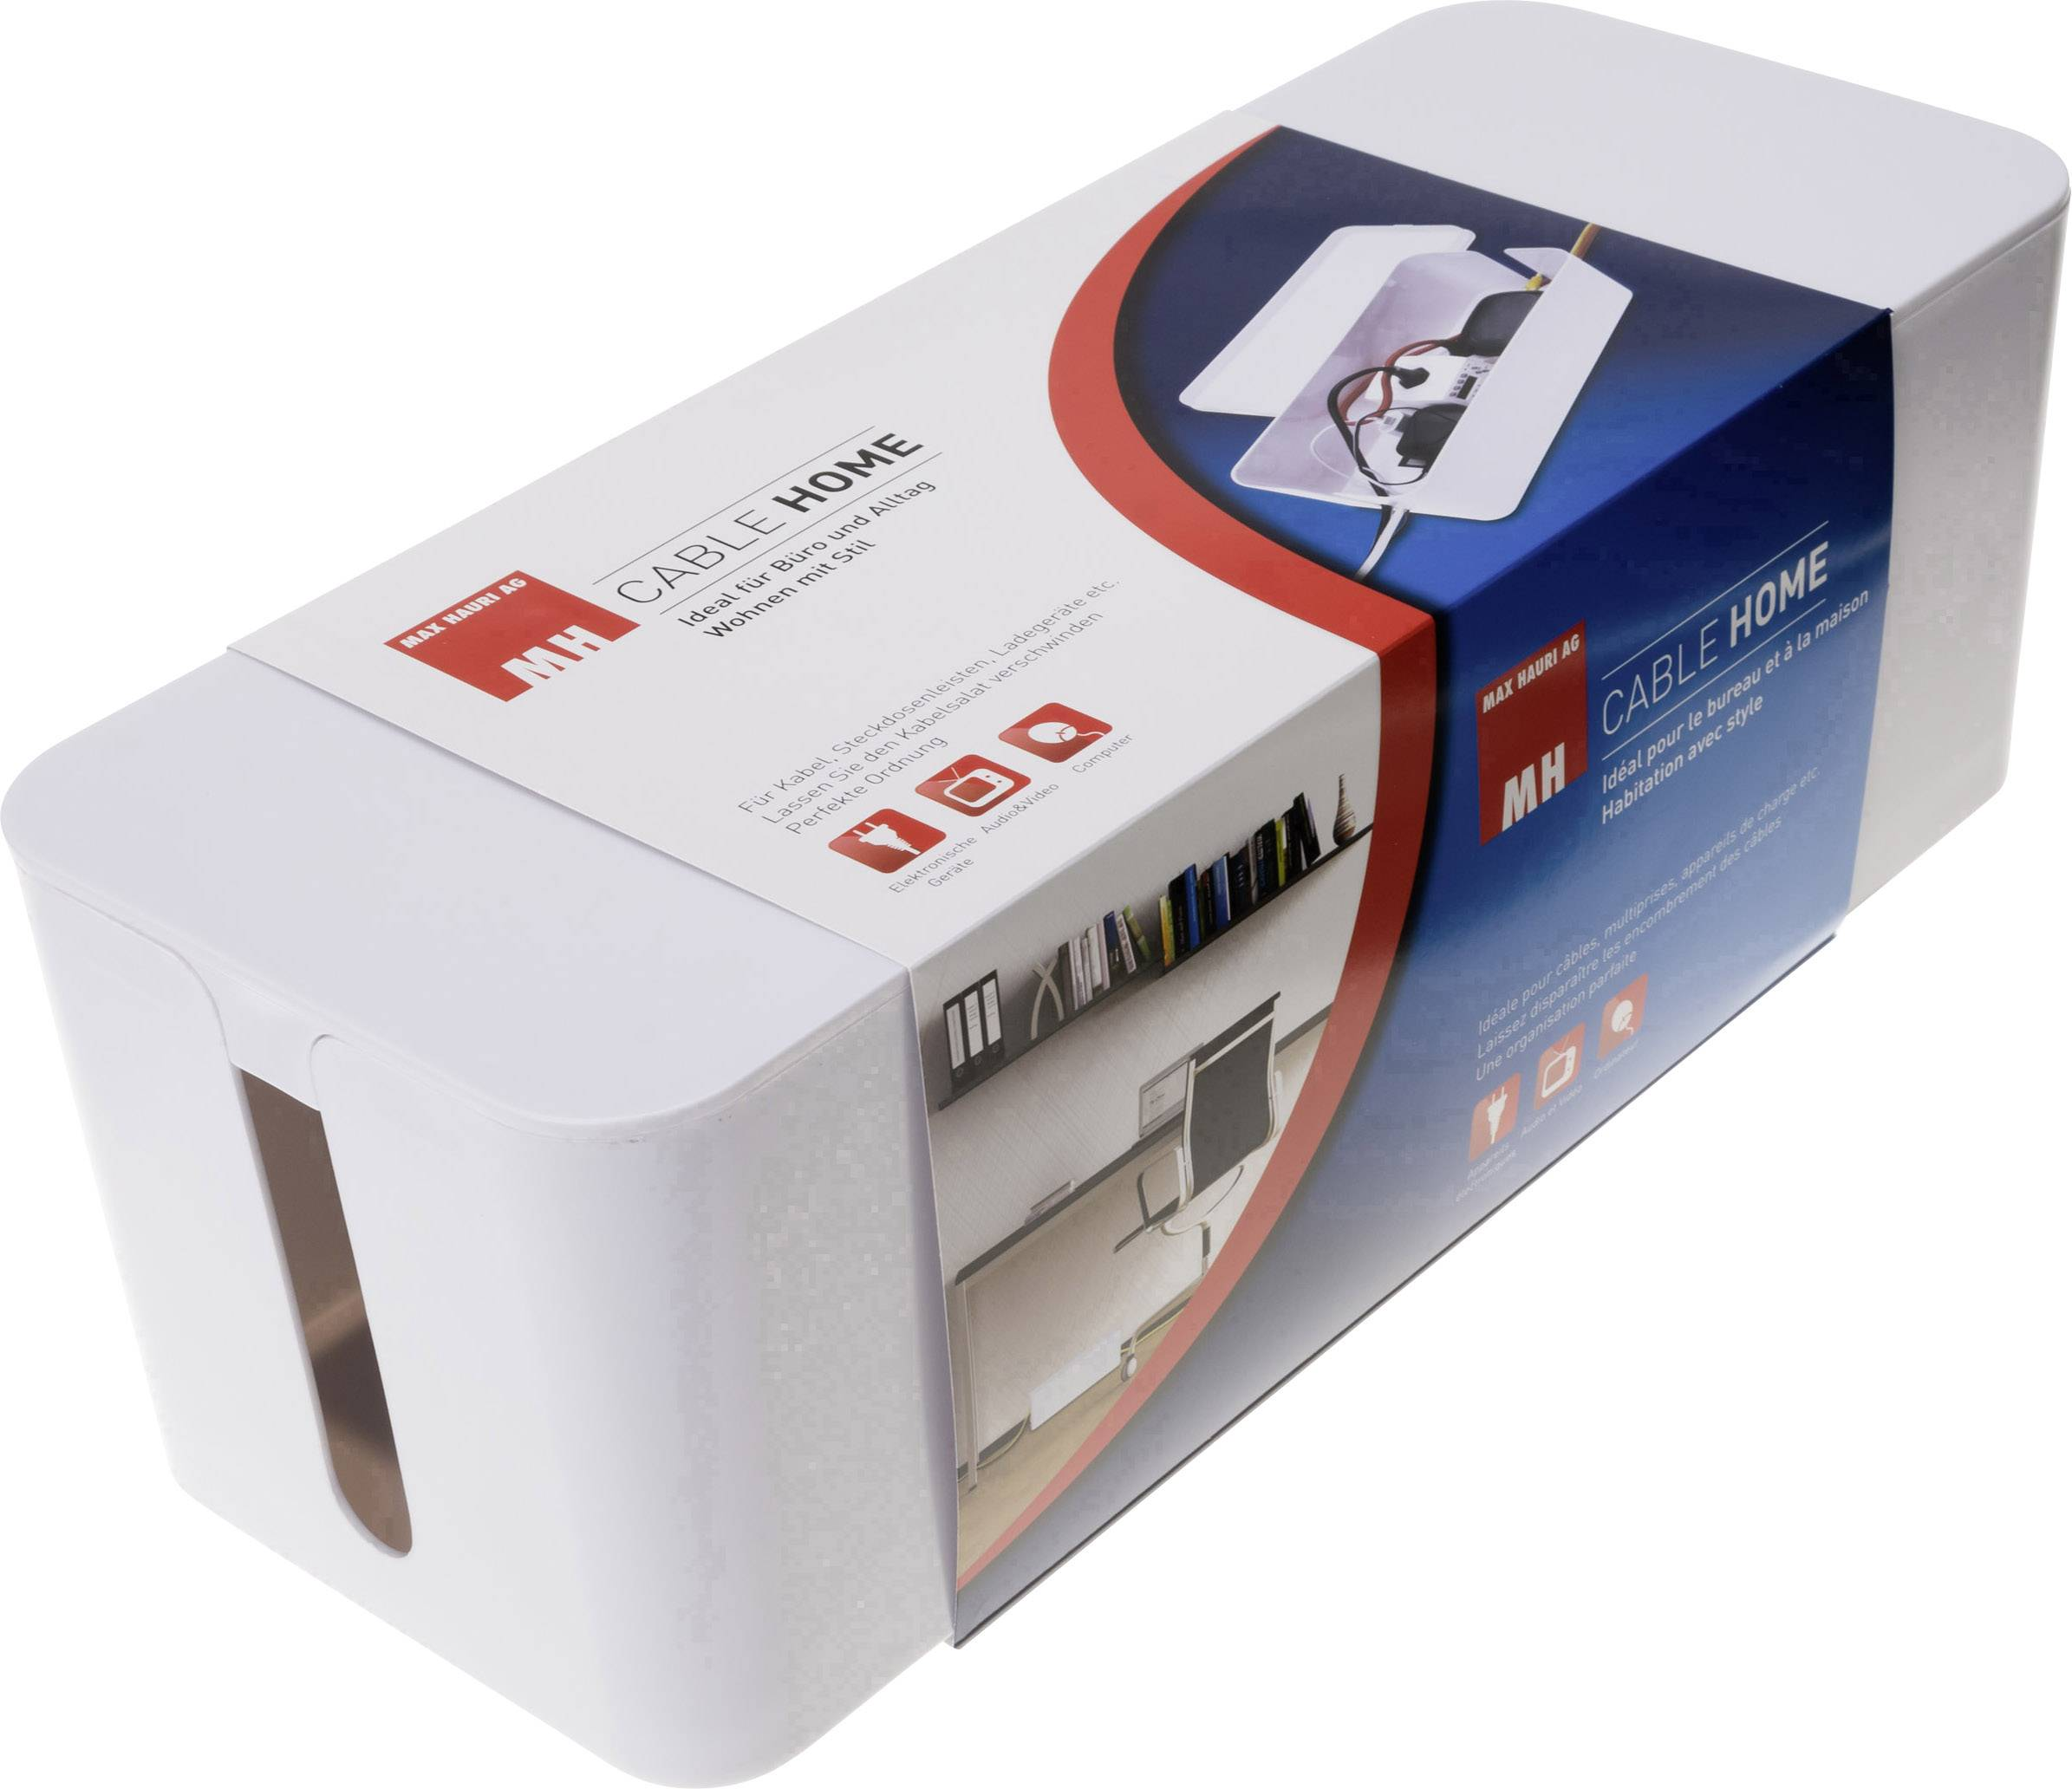 Max Hauri AG Kabel-Box Weiß (L x B x H) 400 x 155 x 135 mm 1 St. 126730